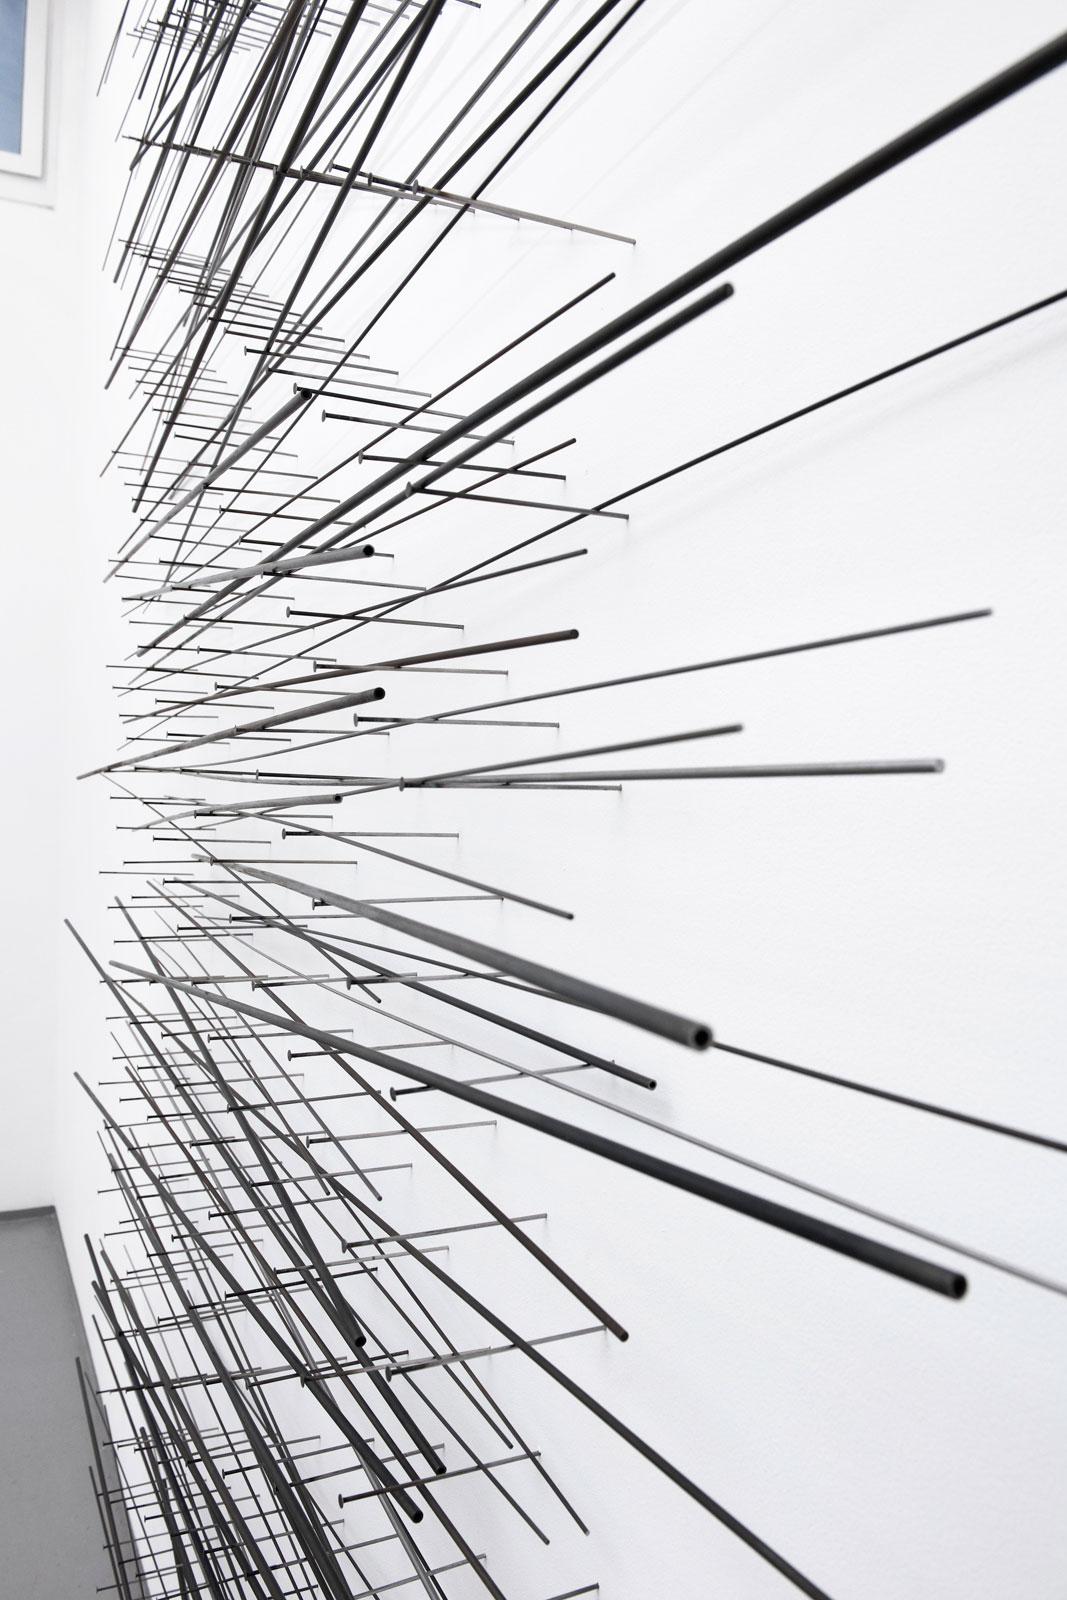 Sculpture, 2009-2010, detail